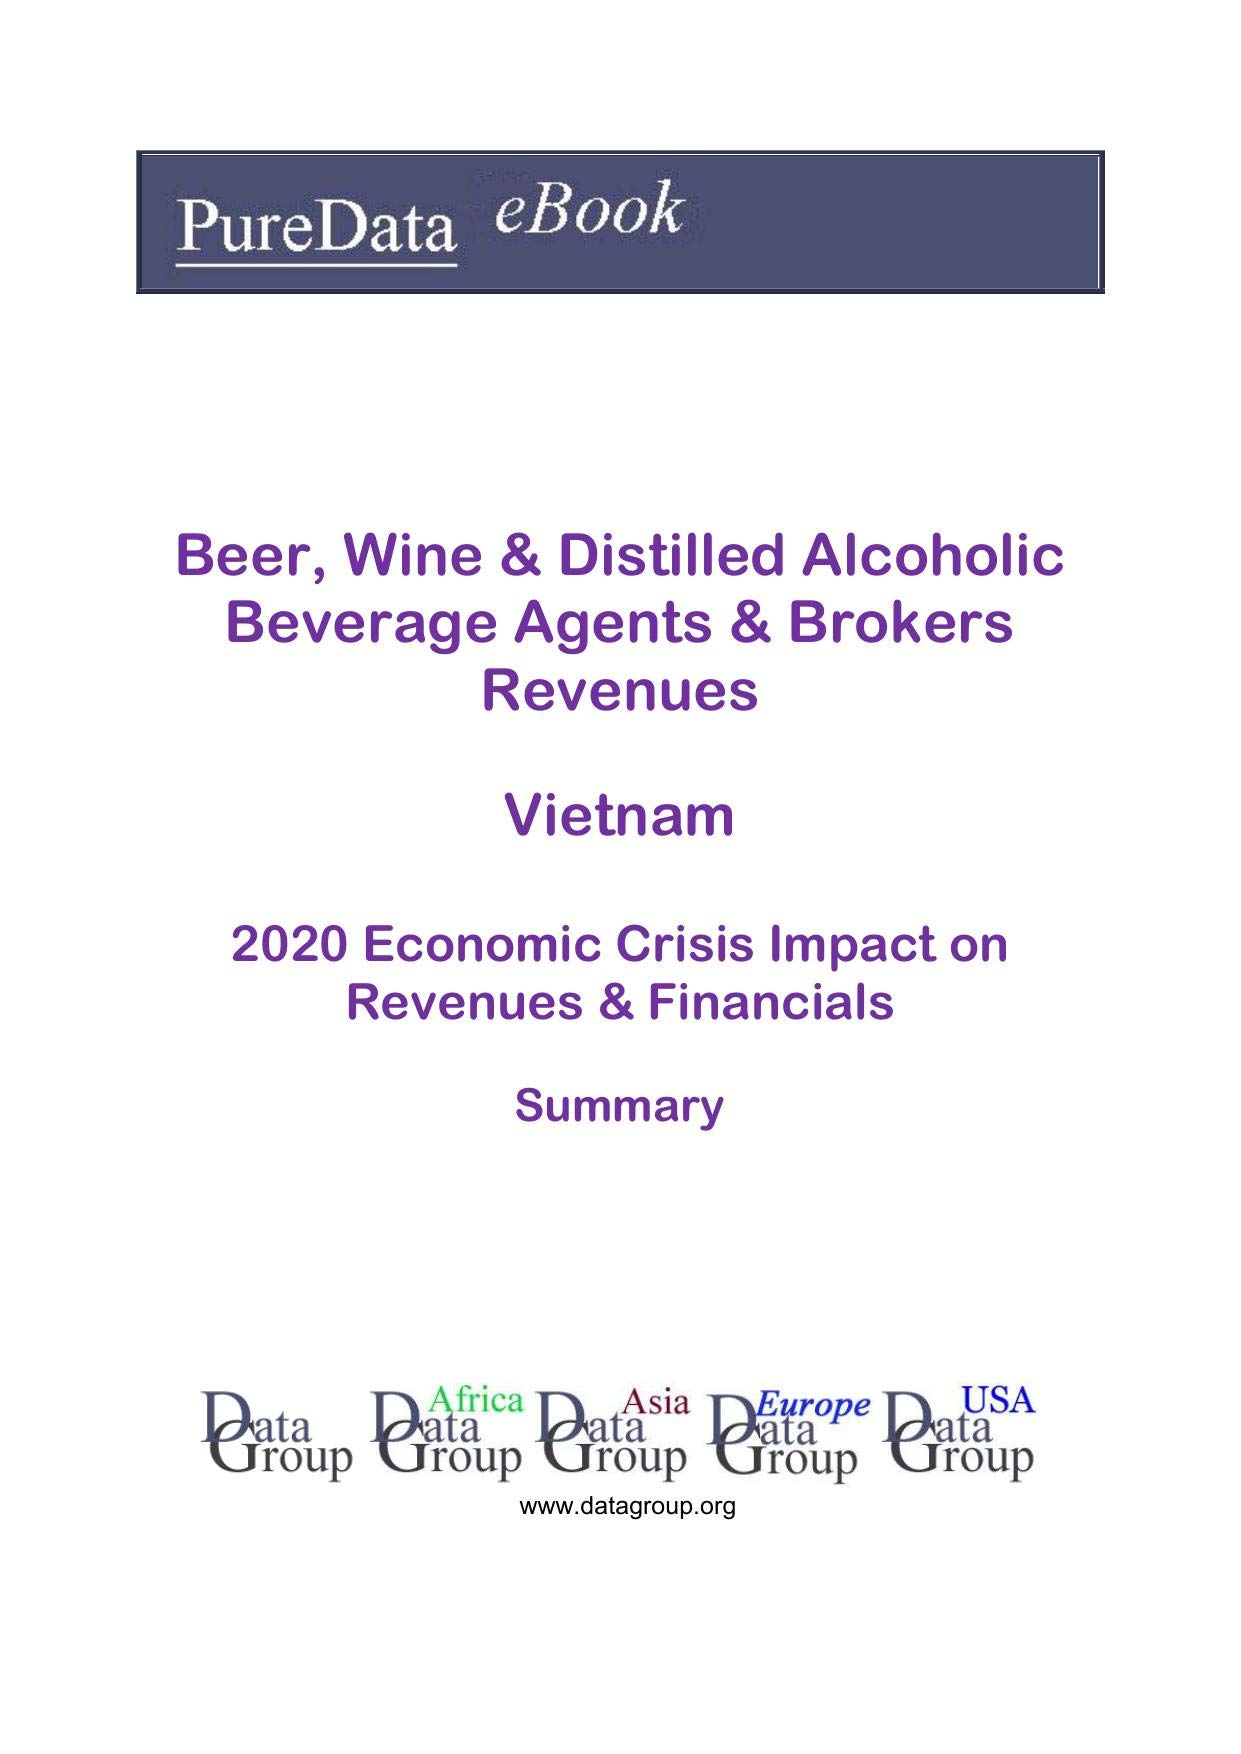 Beer, Wine & Distilled Alcoholic Beverage Agents & Brokers Revenues Vietnam Summary: 2020 Economic Crisis Impact on Revenues & Financials